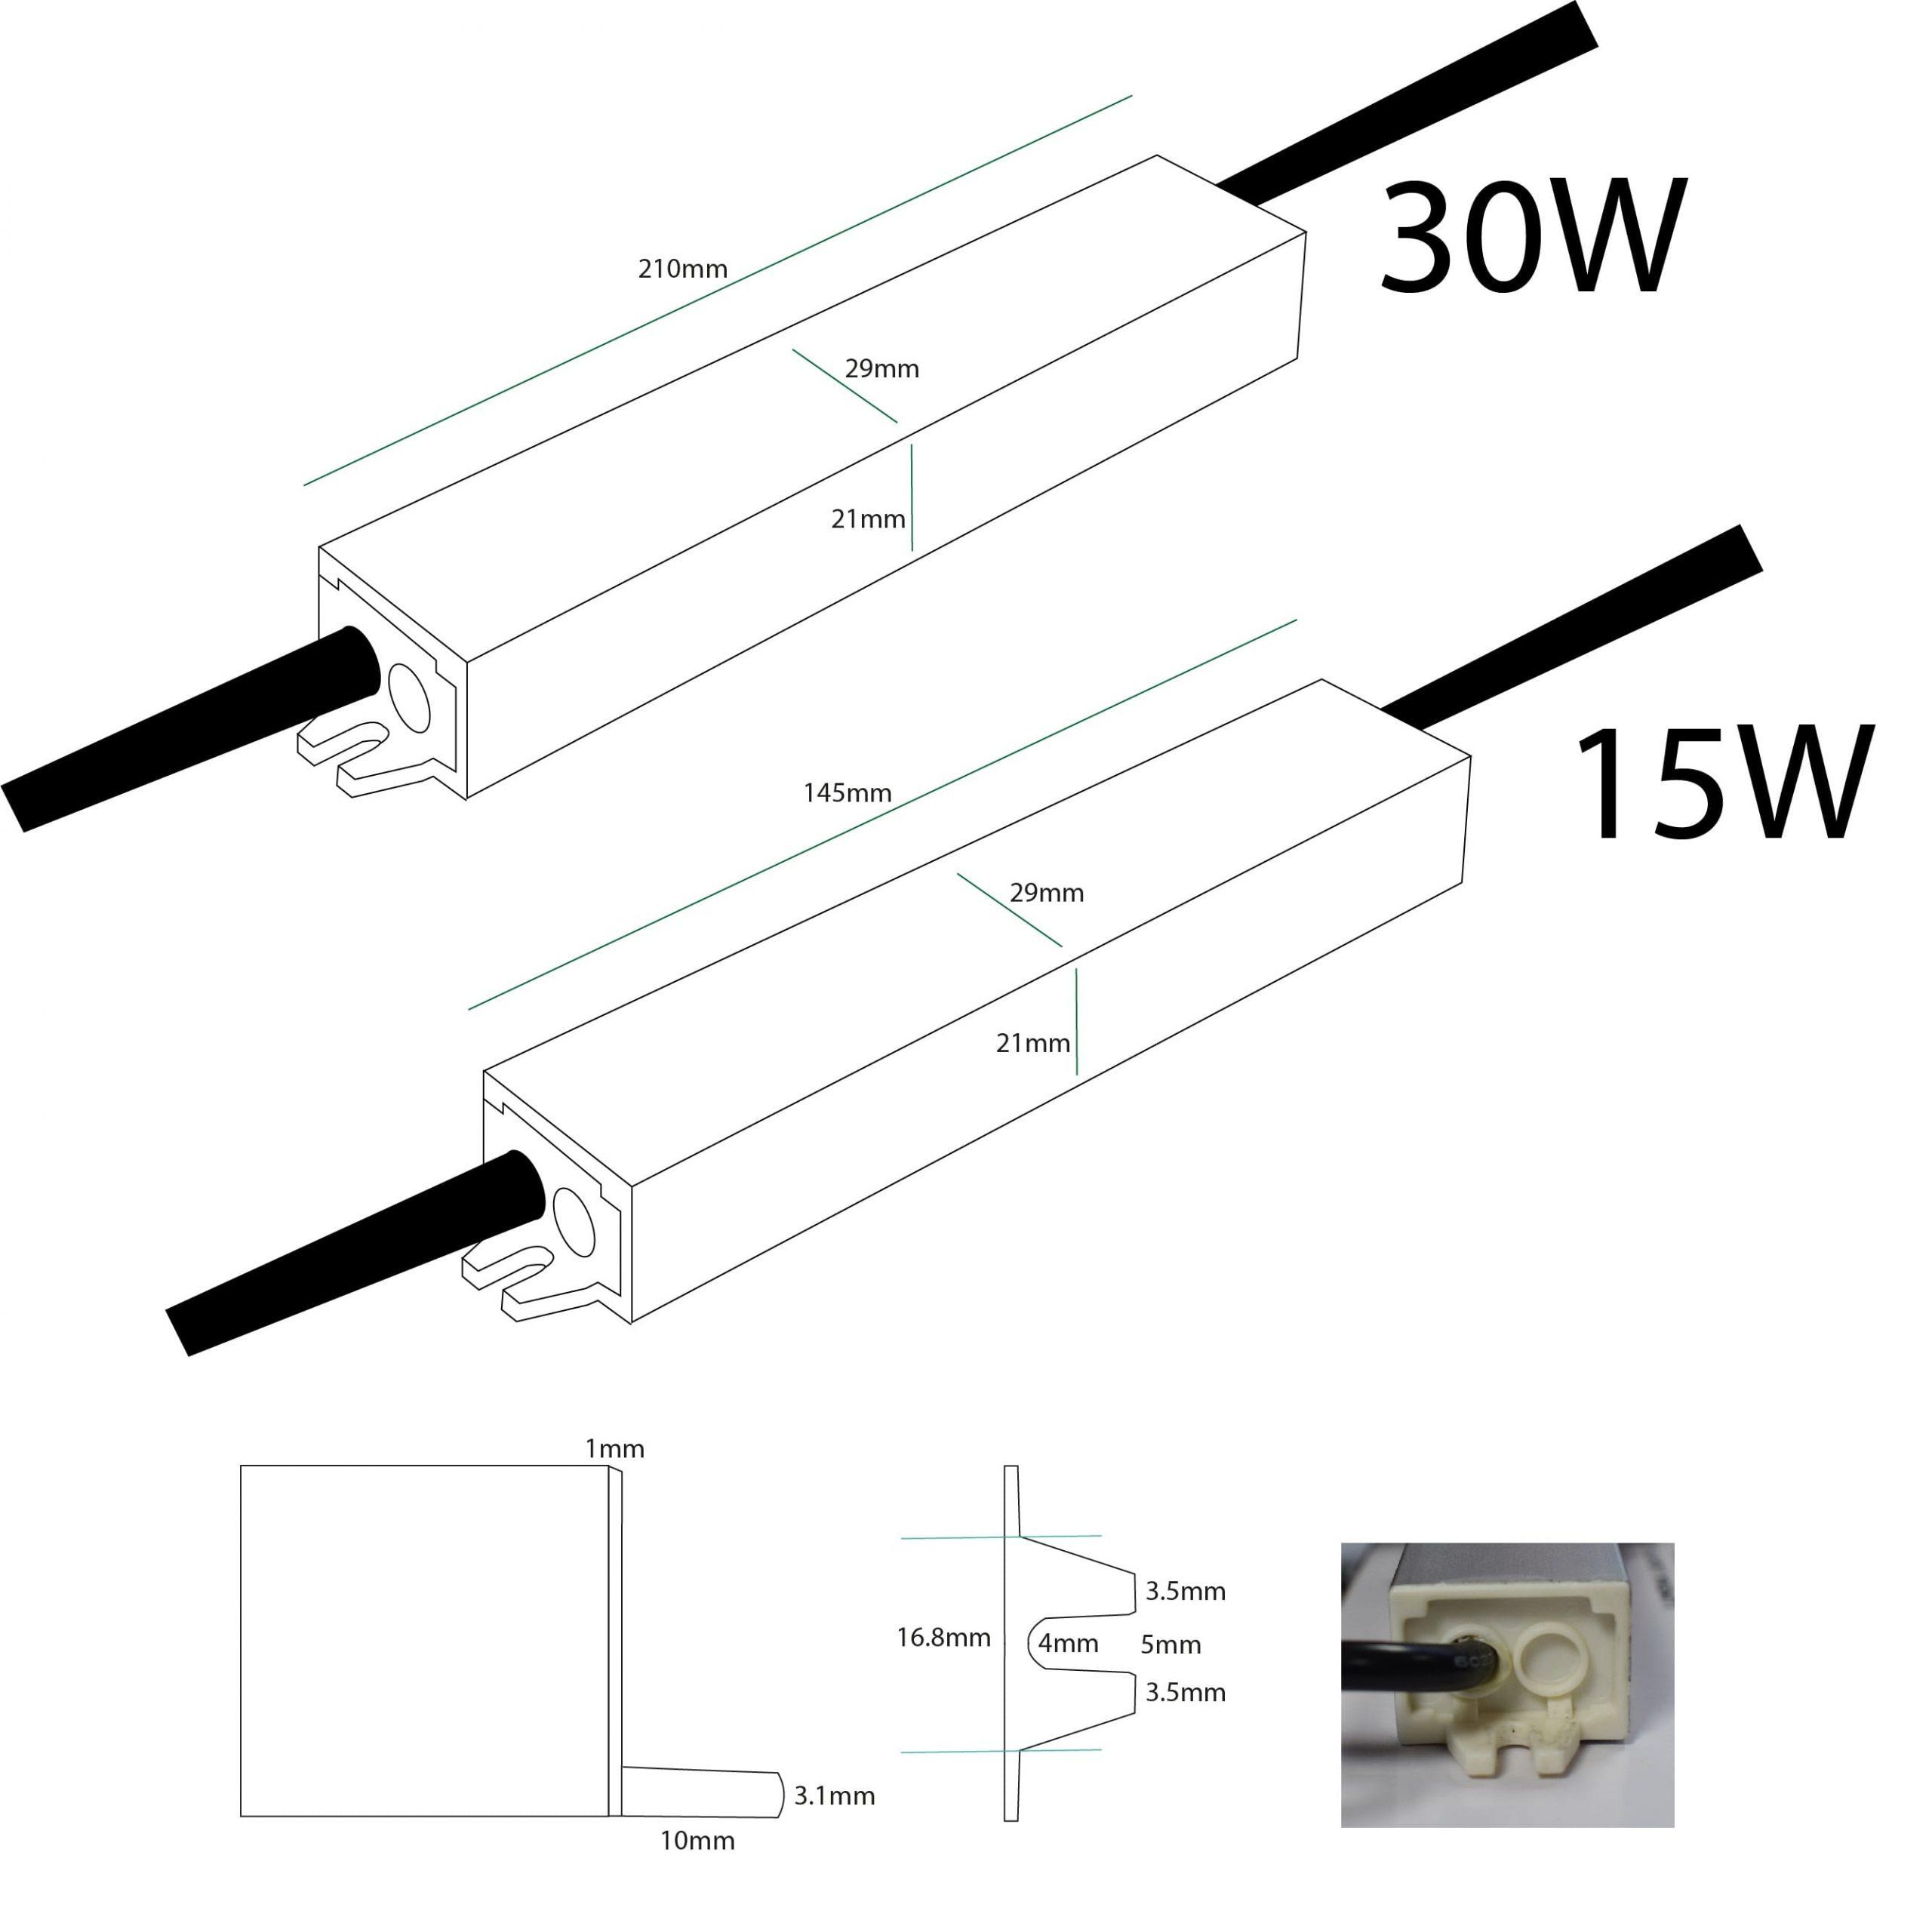 15W & 30W 24V LED Driver Dimensions